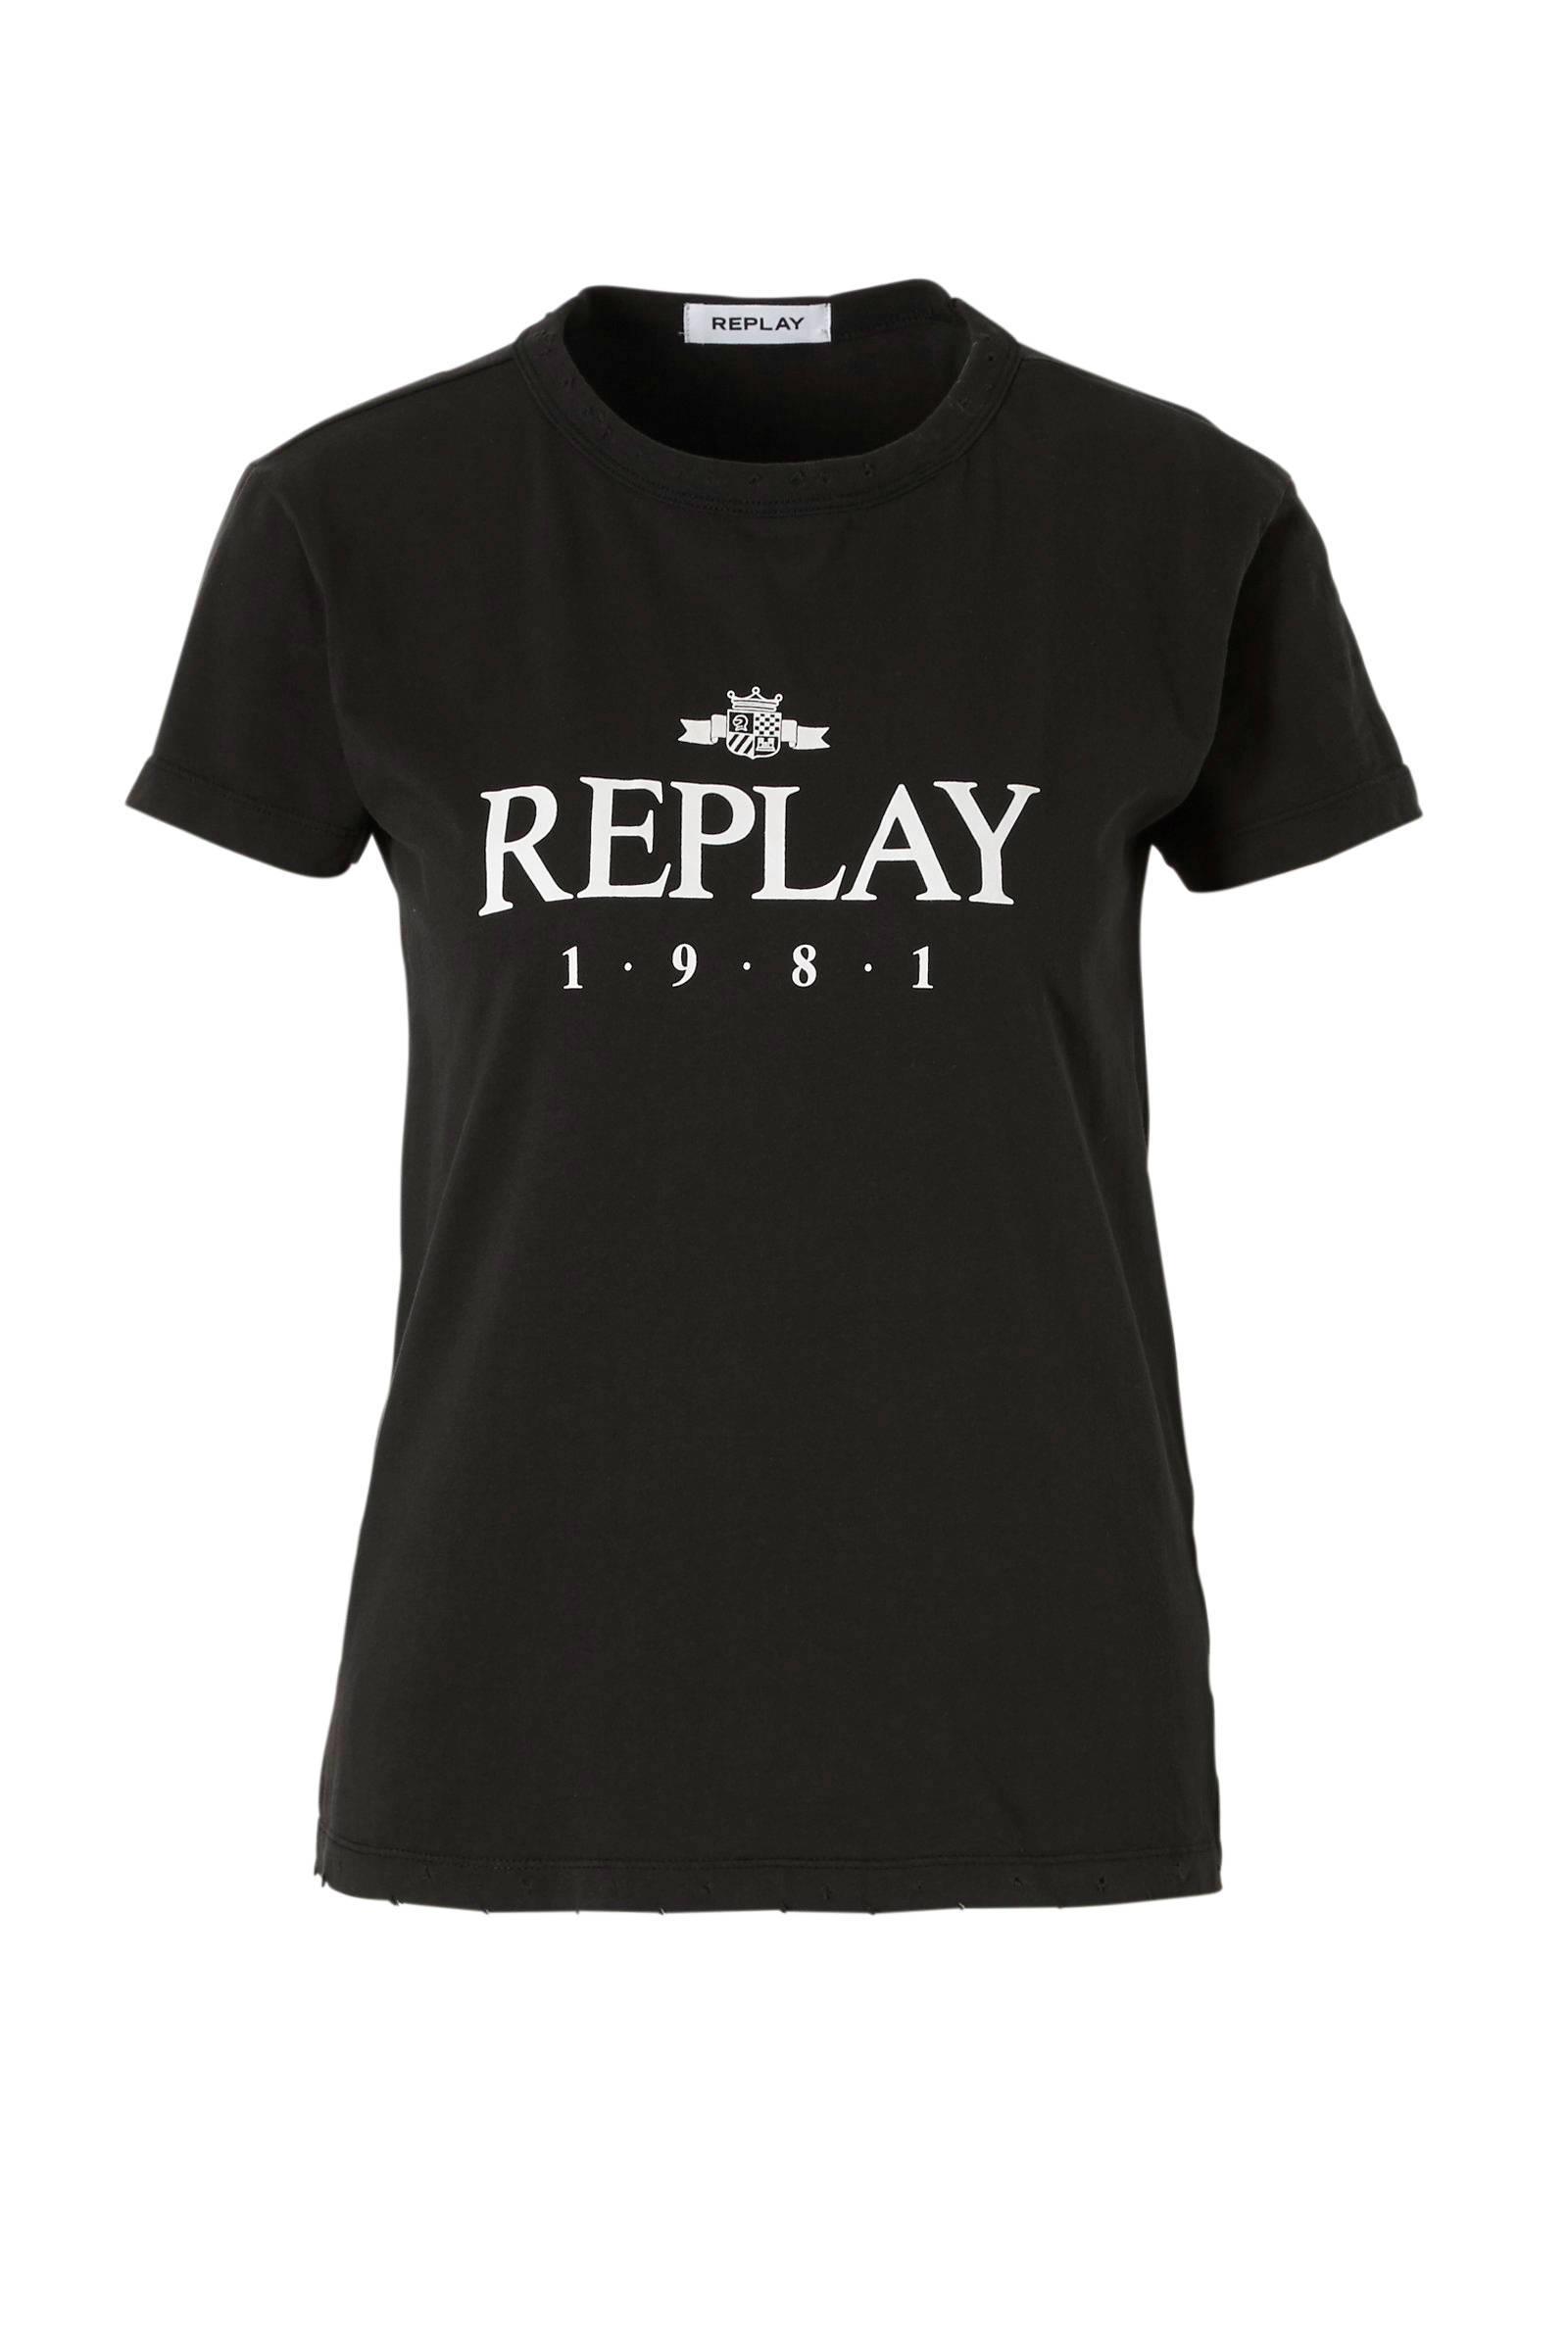 dames shirt met tekst